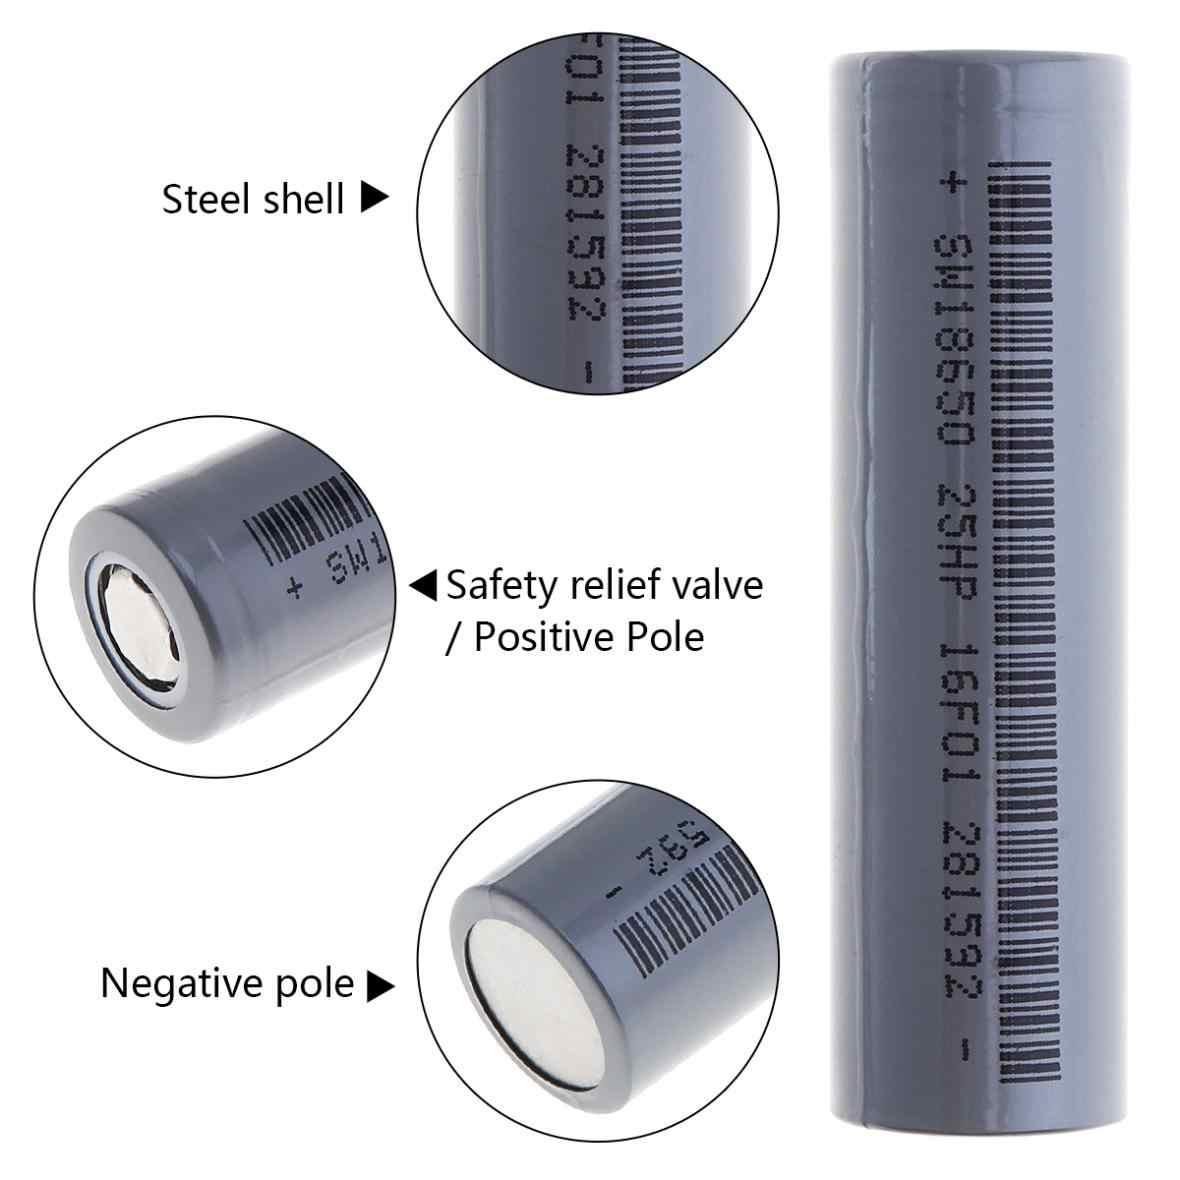 4 шт./компл. Soshine 18650 3,7 V 2600 мА/ч, литий-ионный аккумулятор Батарея с 1000 цикла для фонарик Фара головного света + Батарея Чехол Коробка для хранения